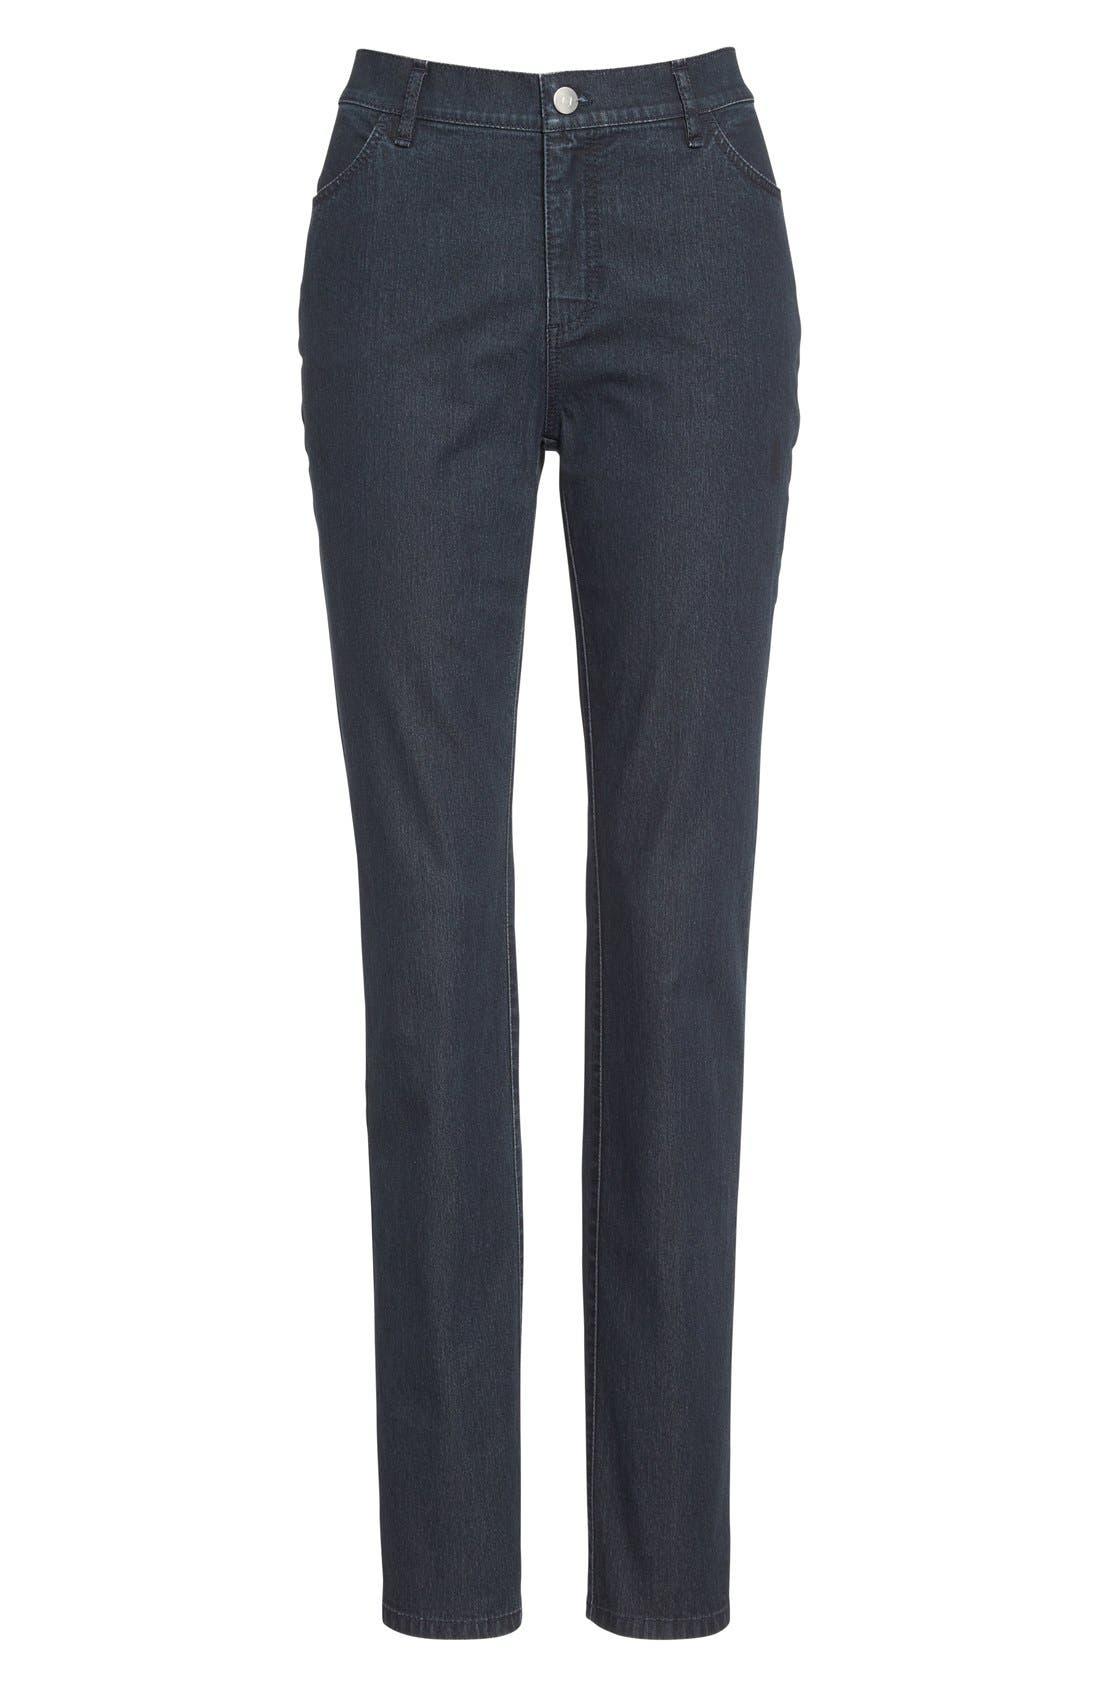 'Primo Denim' Curvy Fit Slim Leg Jeans,                             Alternate thumbnail 7, color,                             INDIGO